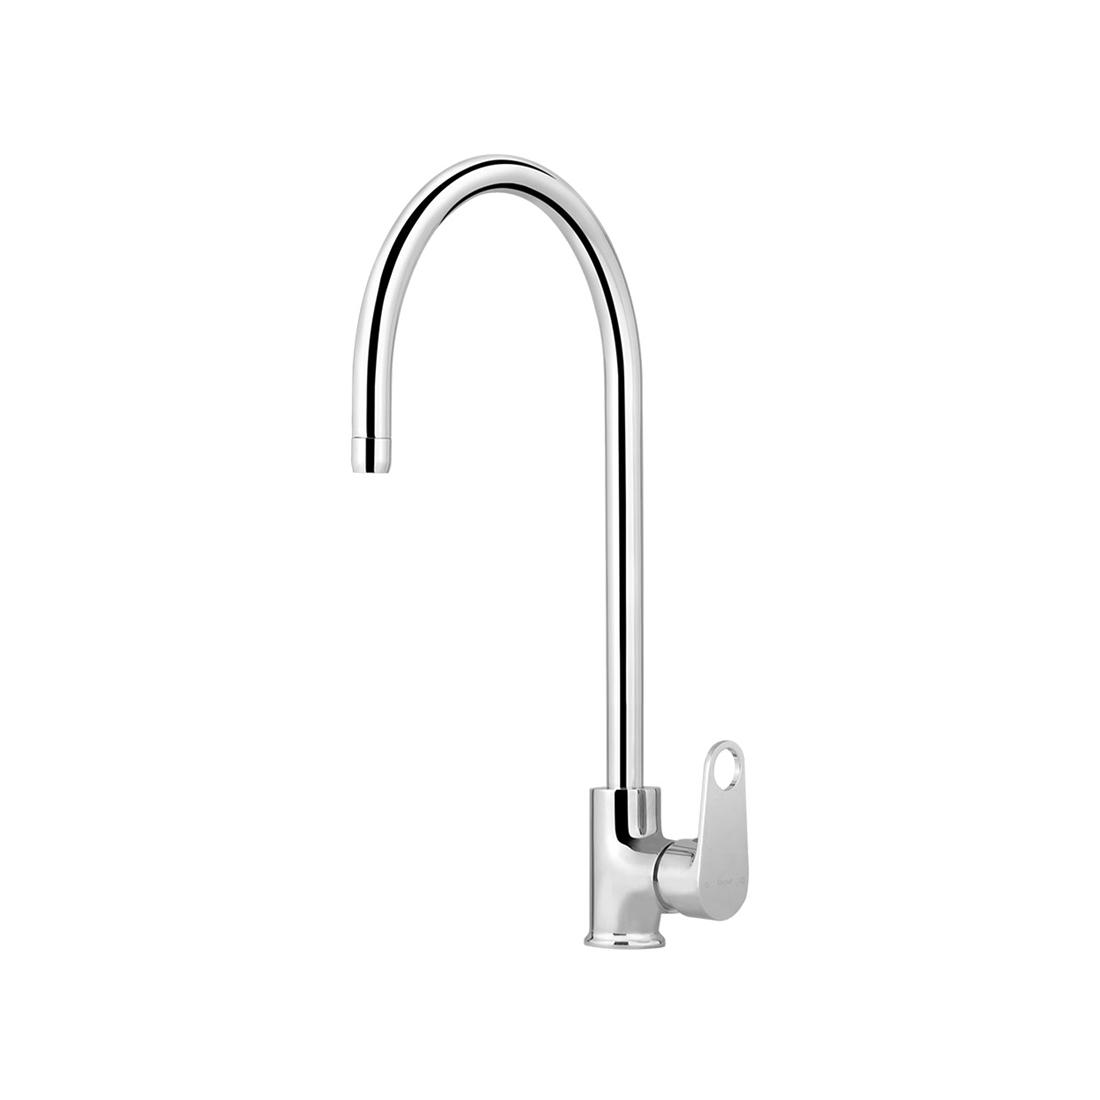 Kerovit Hydrus Plus KB511047 Single Lever Sink Mixer With Swivel Spout